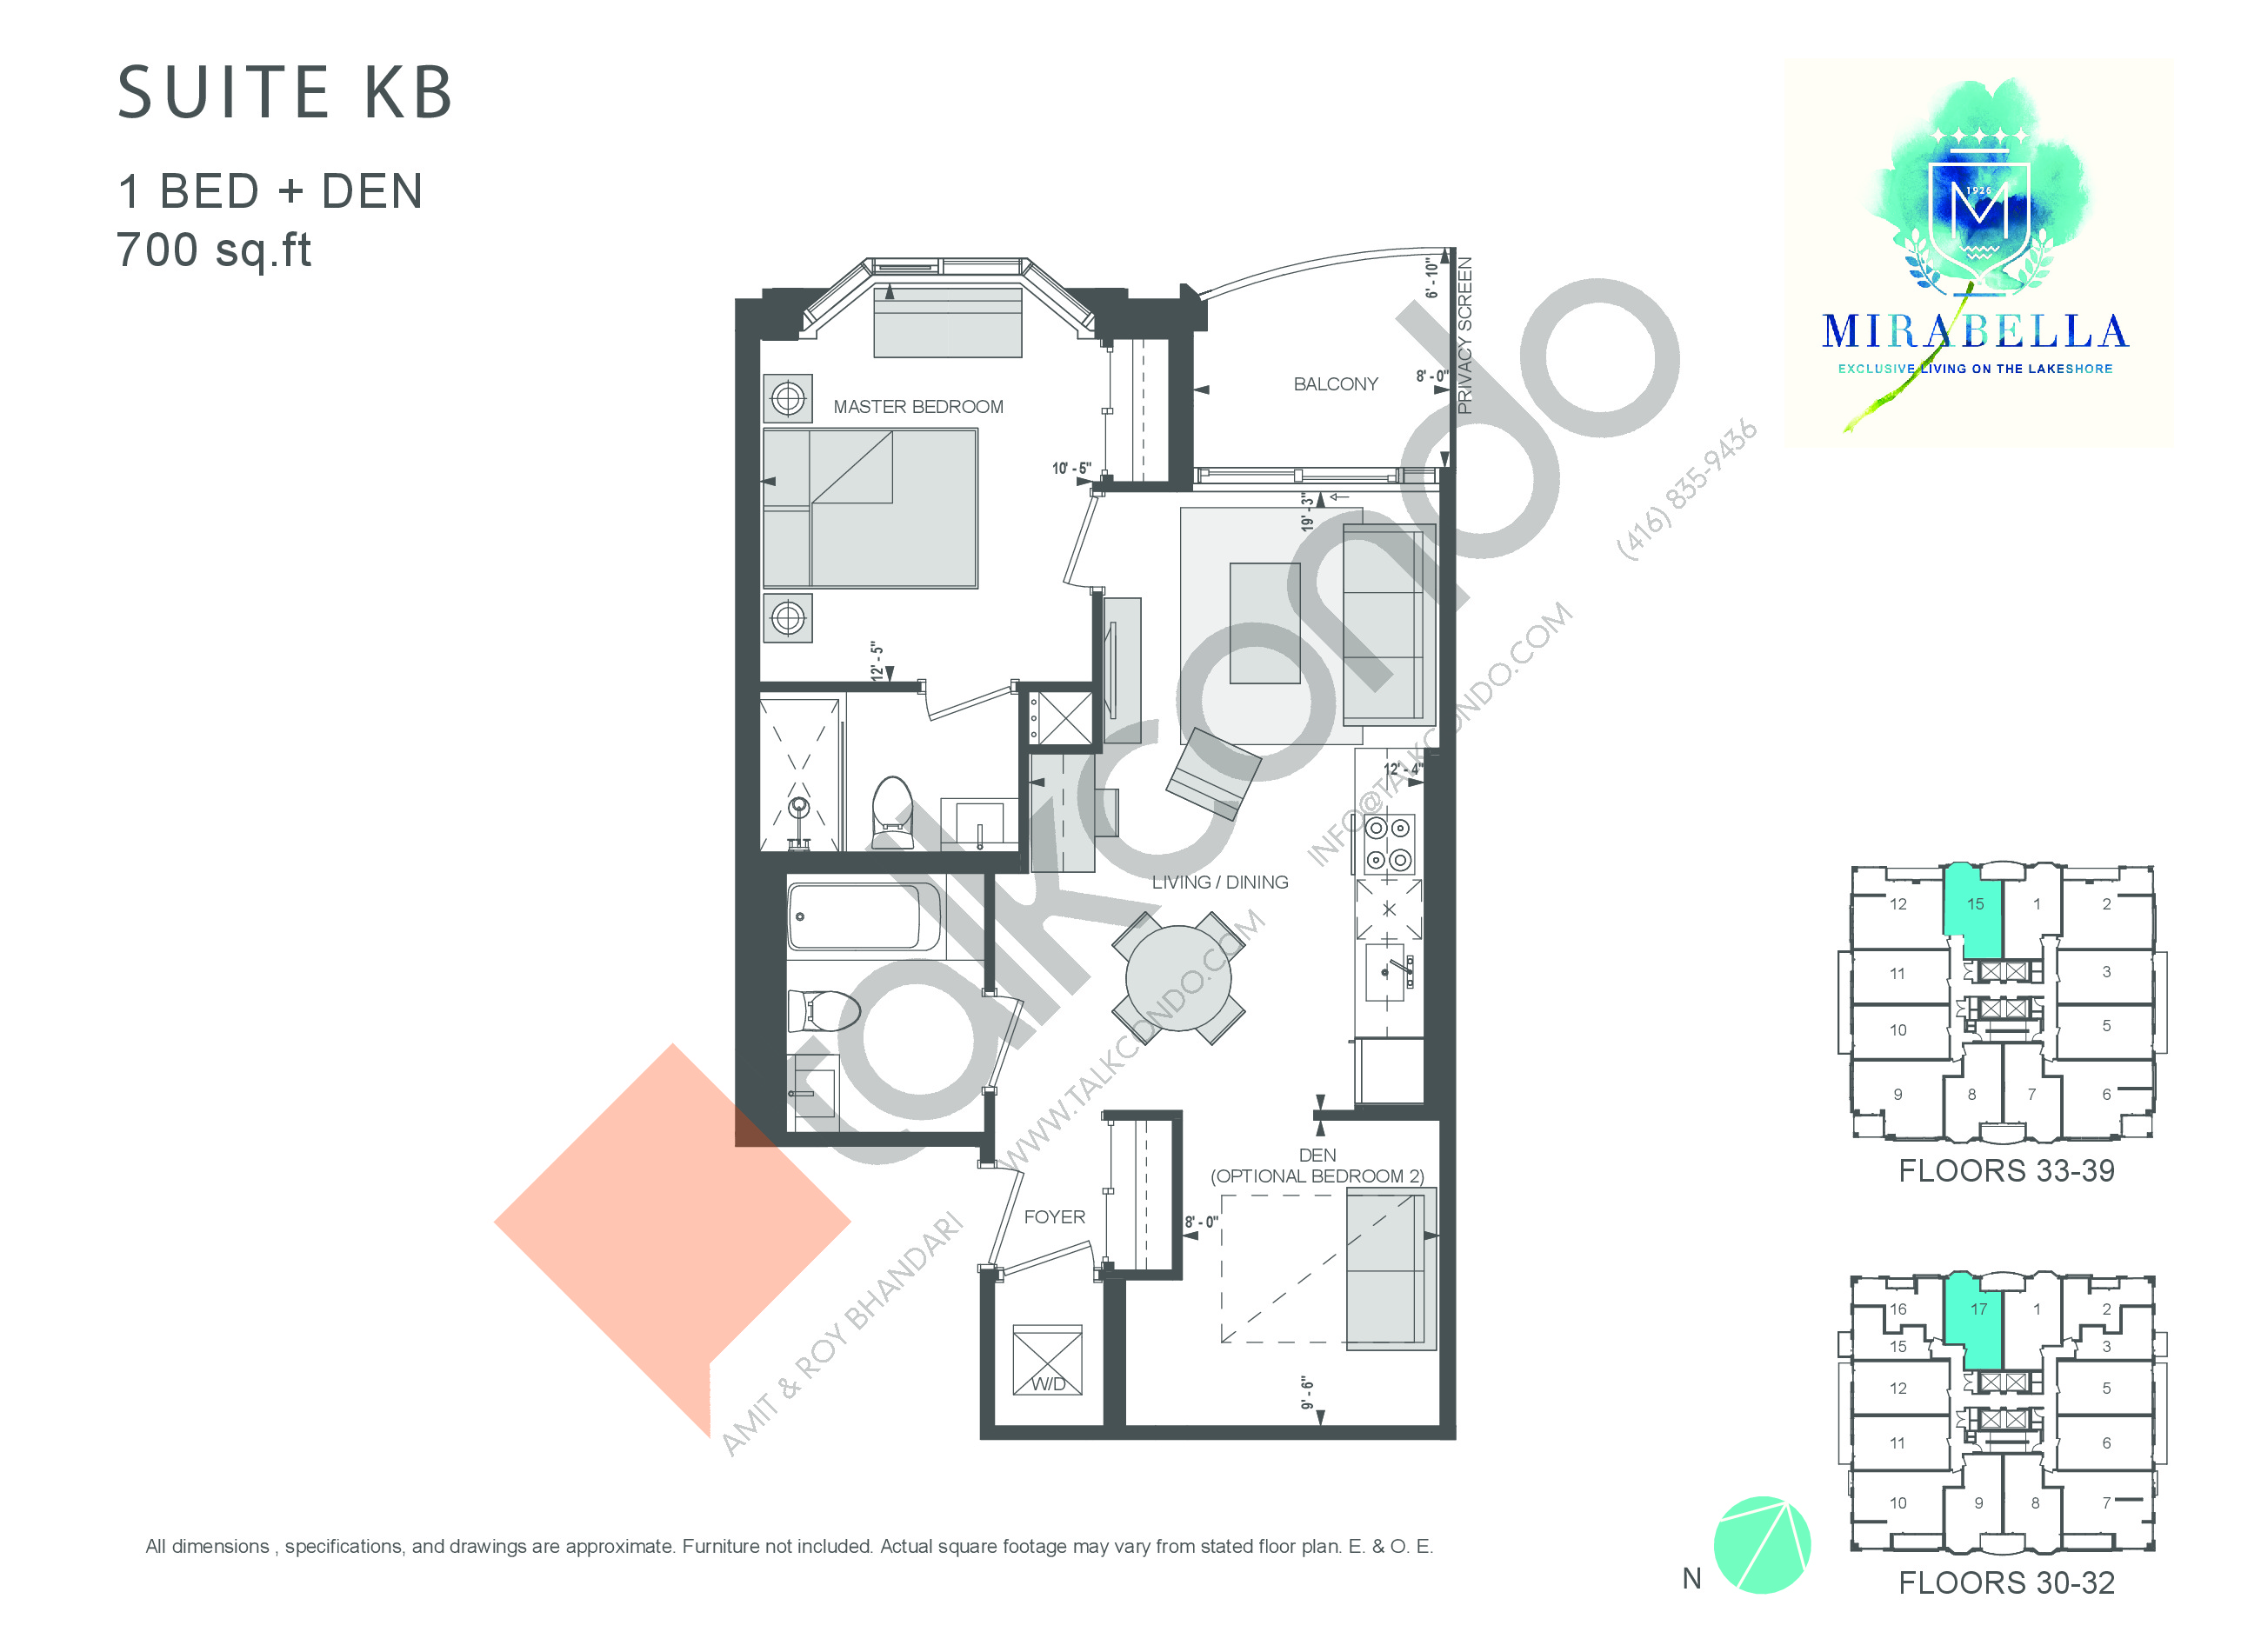 Suite KB Floor Plan at Mirabella Luxury Condos East Tower - 700 sq.ft